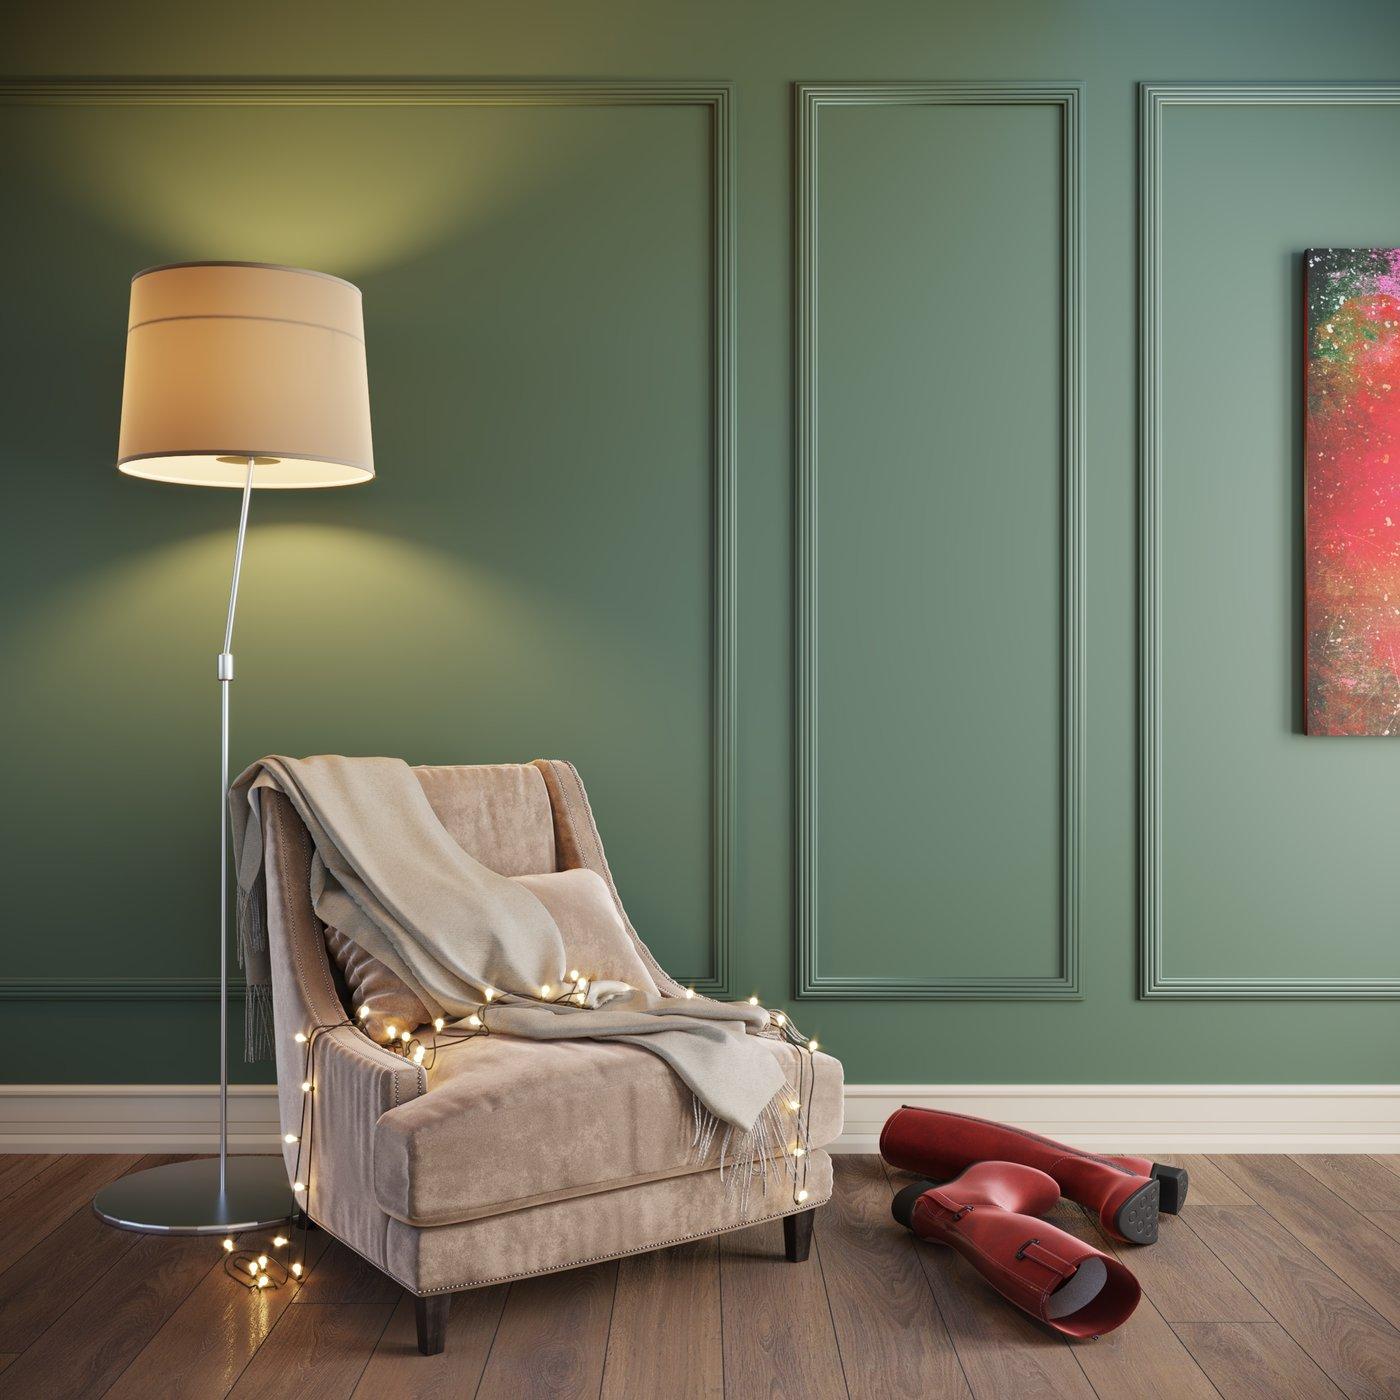 Interior paint advertisement